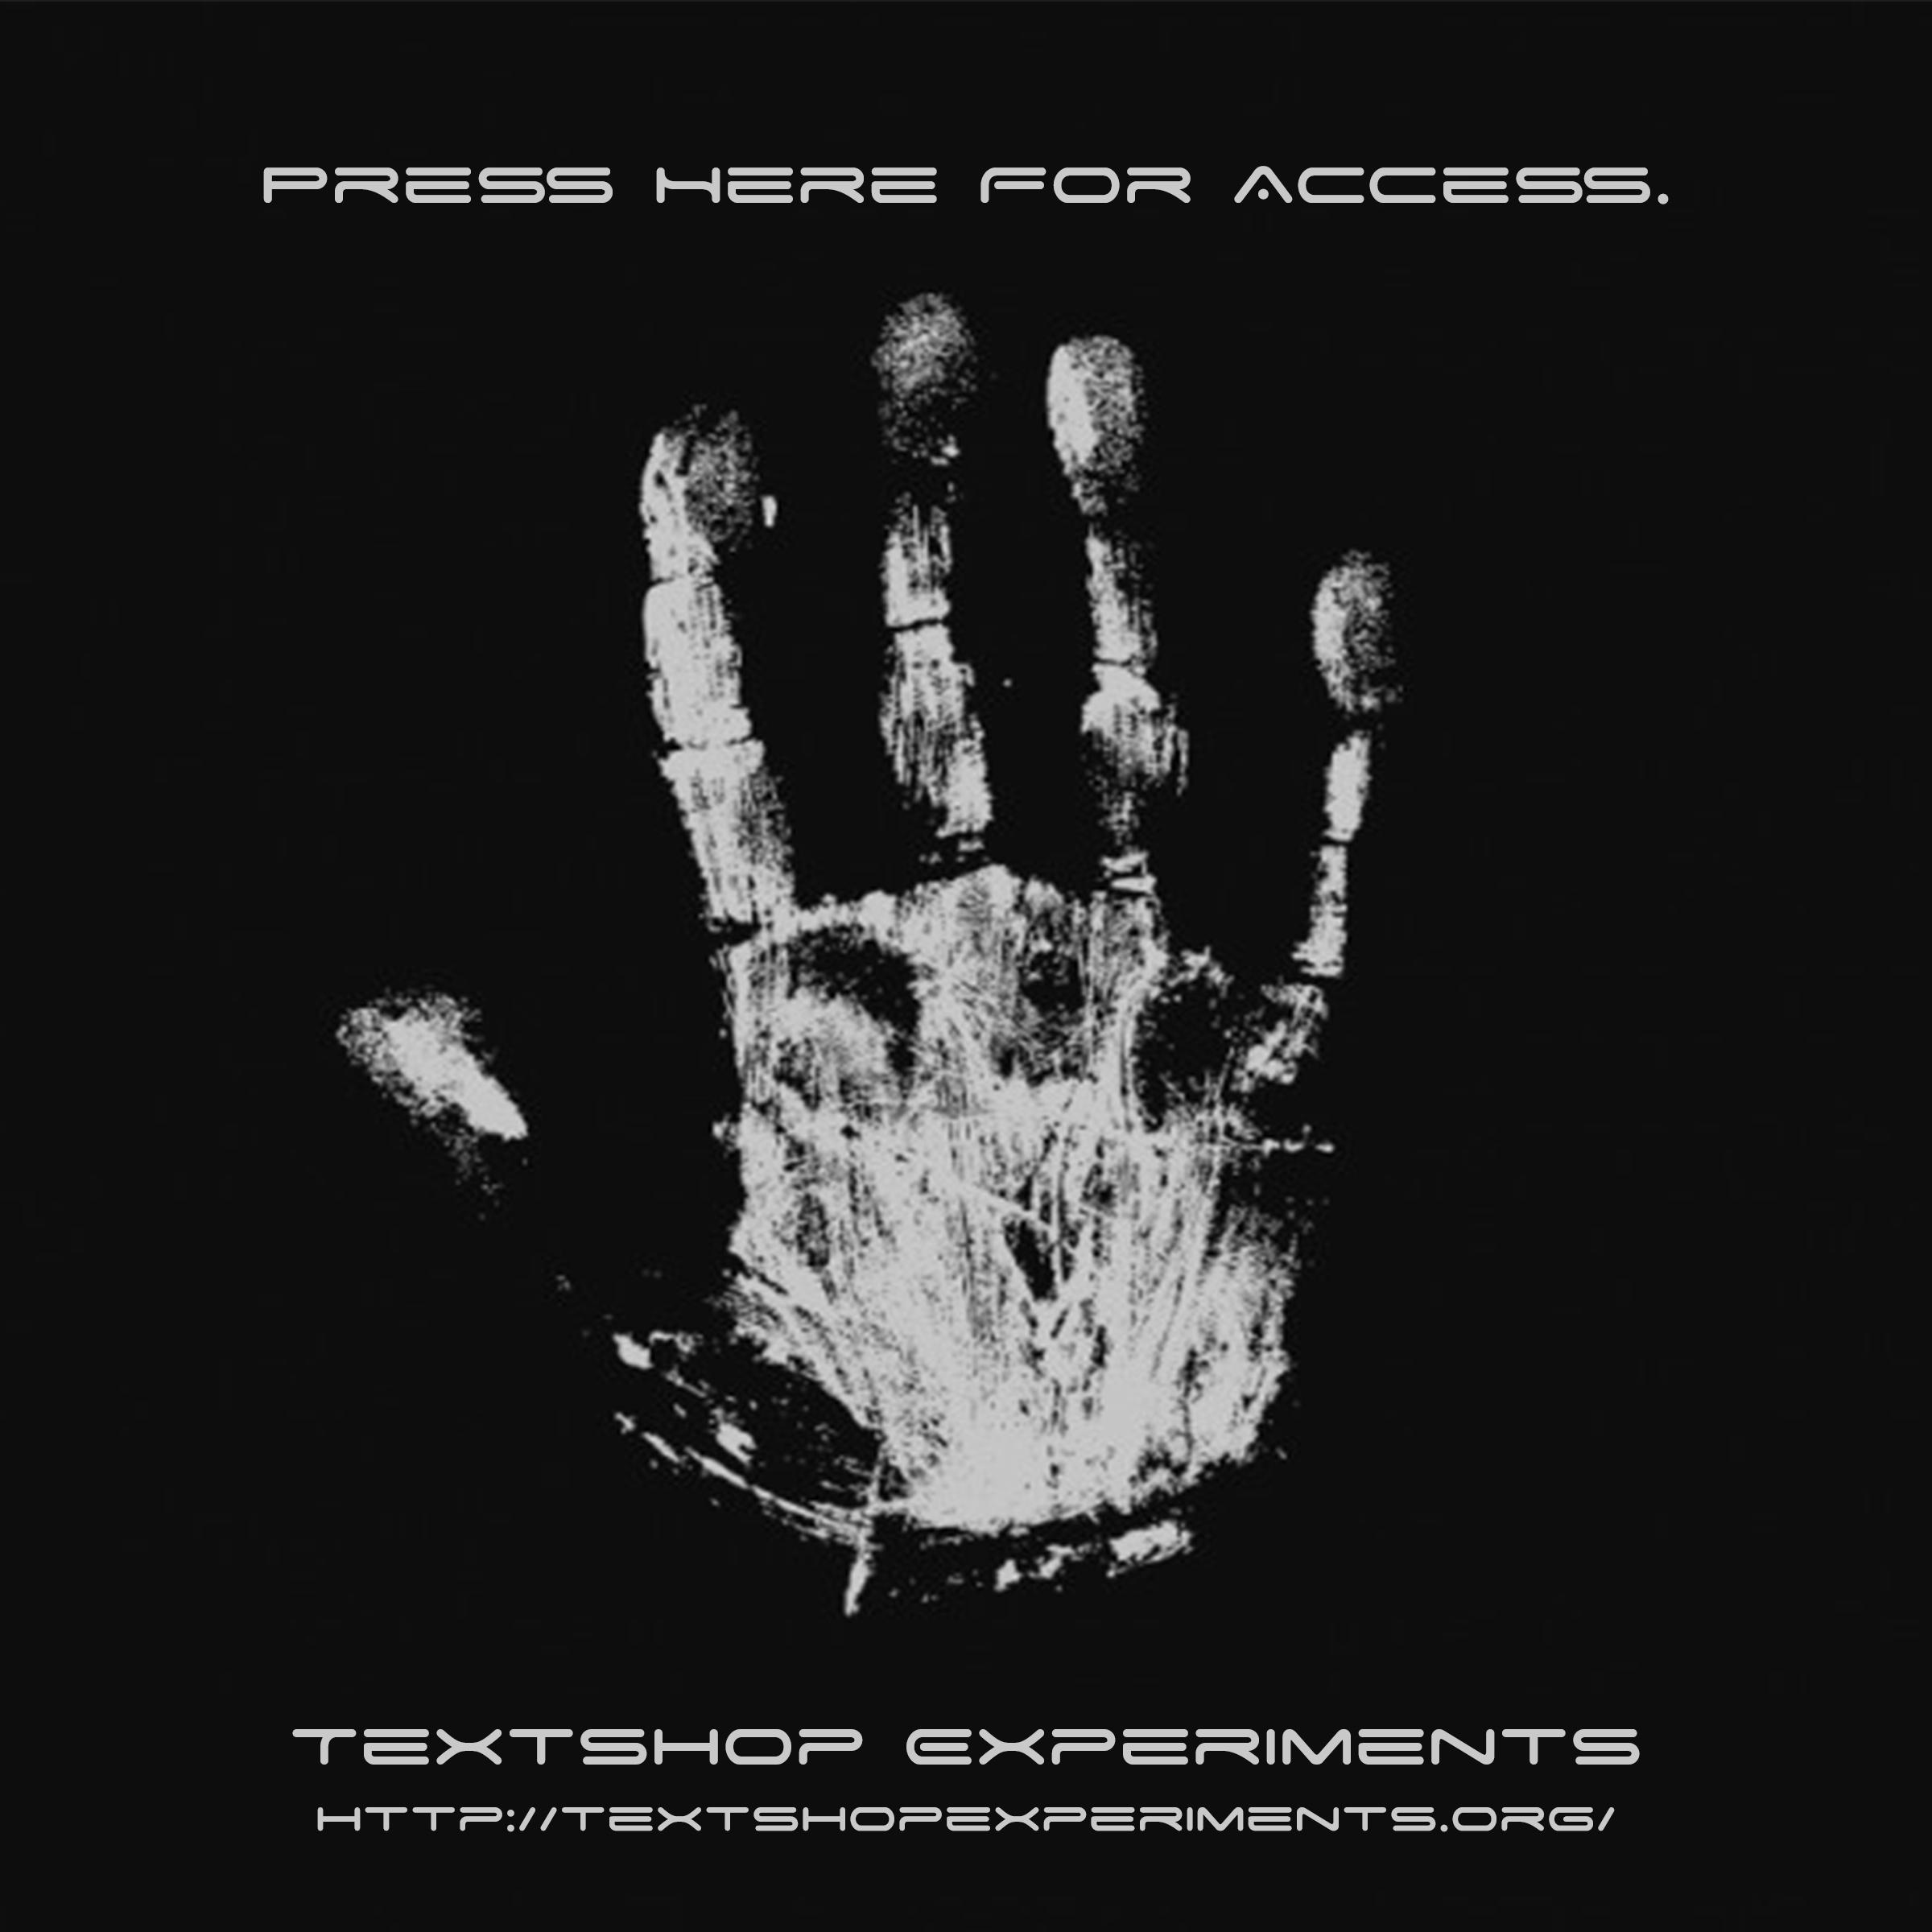 Textshop 01 Poster 03.jpg